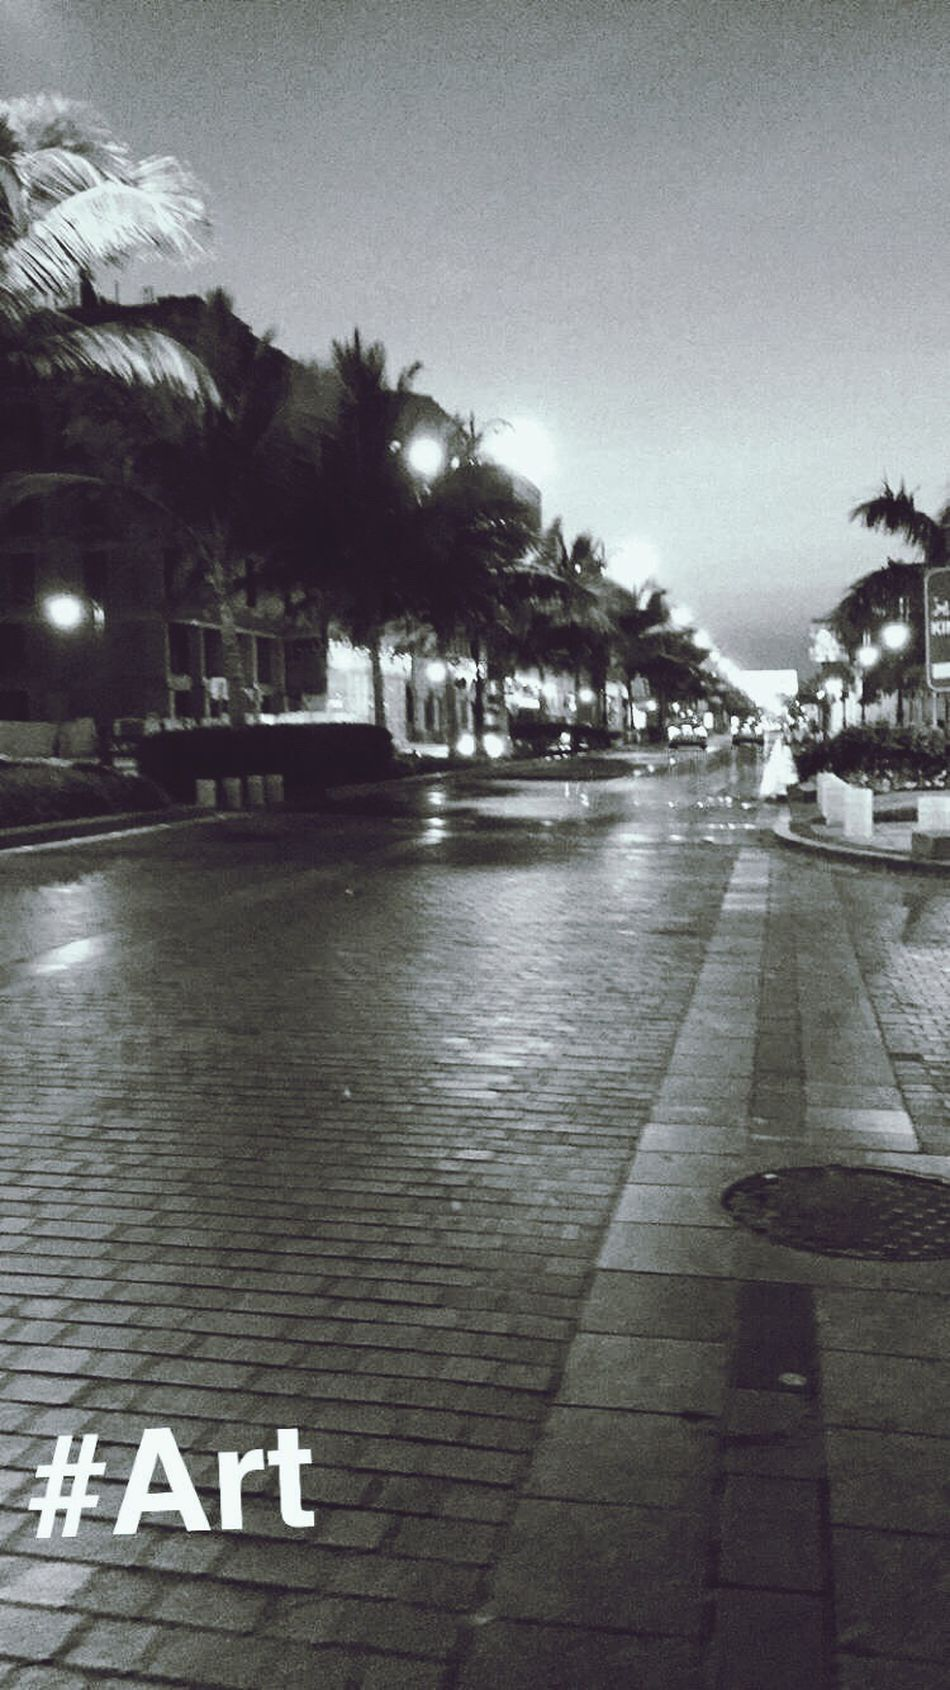 Jeddah😍❤️ Jeddah Jeddah City Hail City || مدينة حايل Saudi Arabia Spine